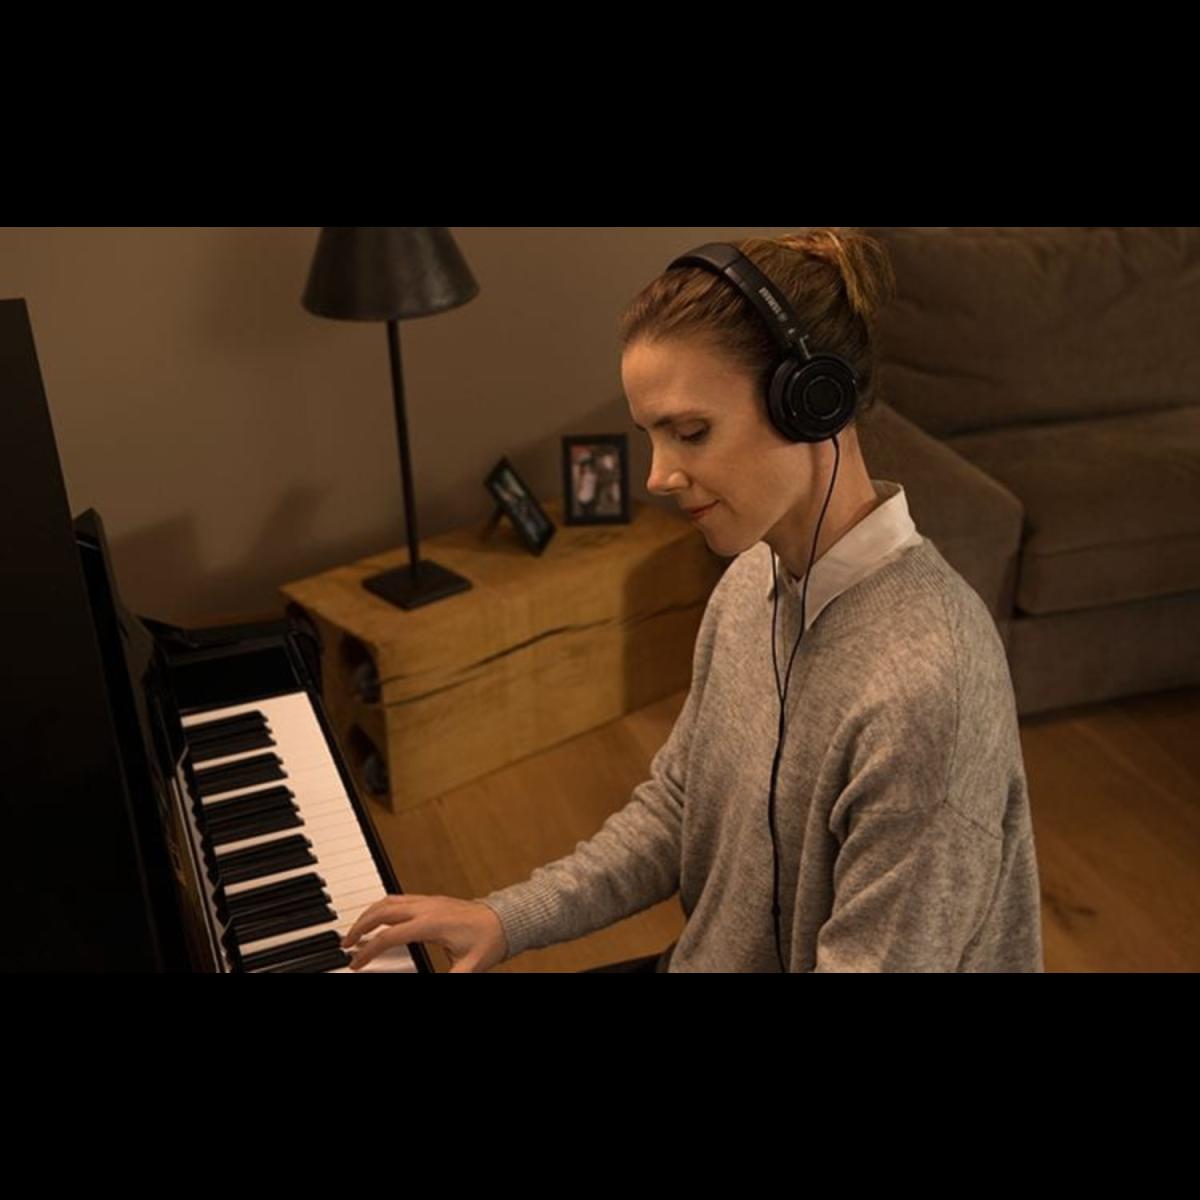 Yamaha - GC1SHTA2 - TransAcoustic Grand Piano-headphone